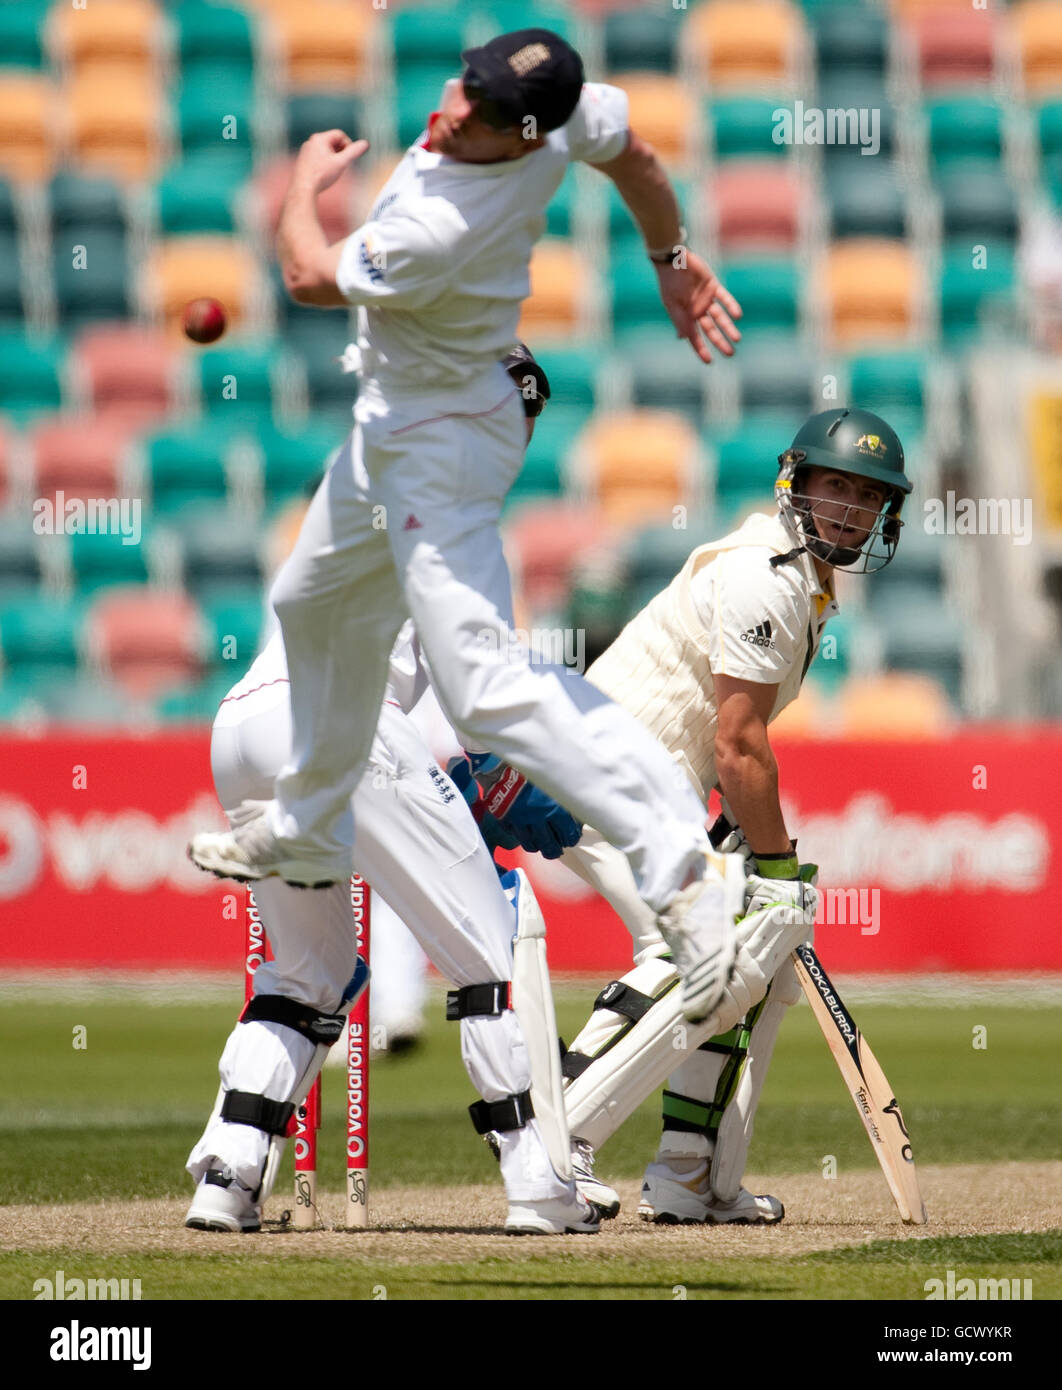 Cricket - Tour Match - Australia A v England XI - Day Four - Bellerive Oval - Stock Image